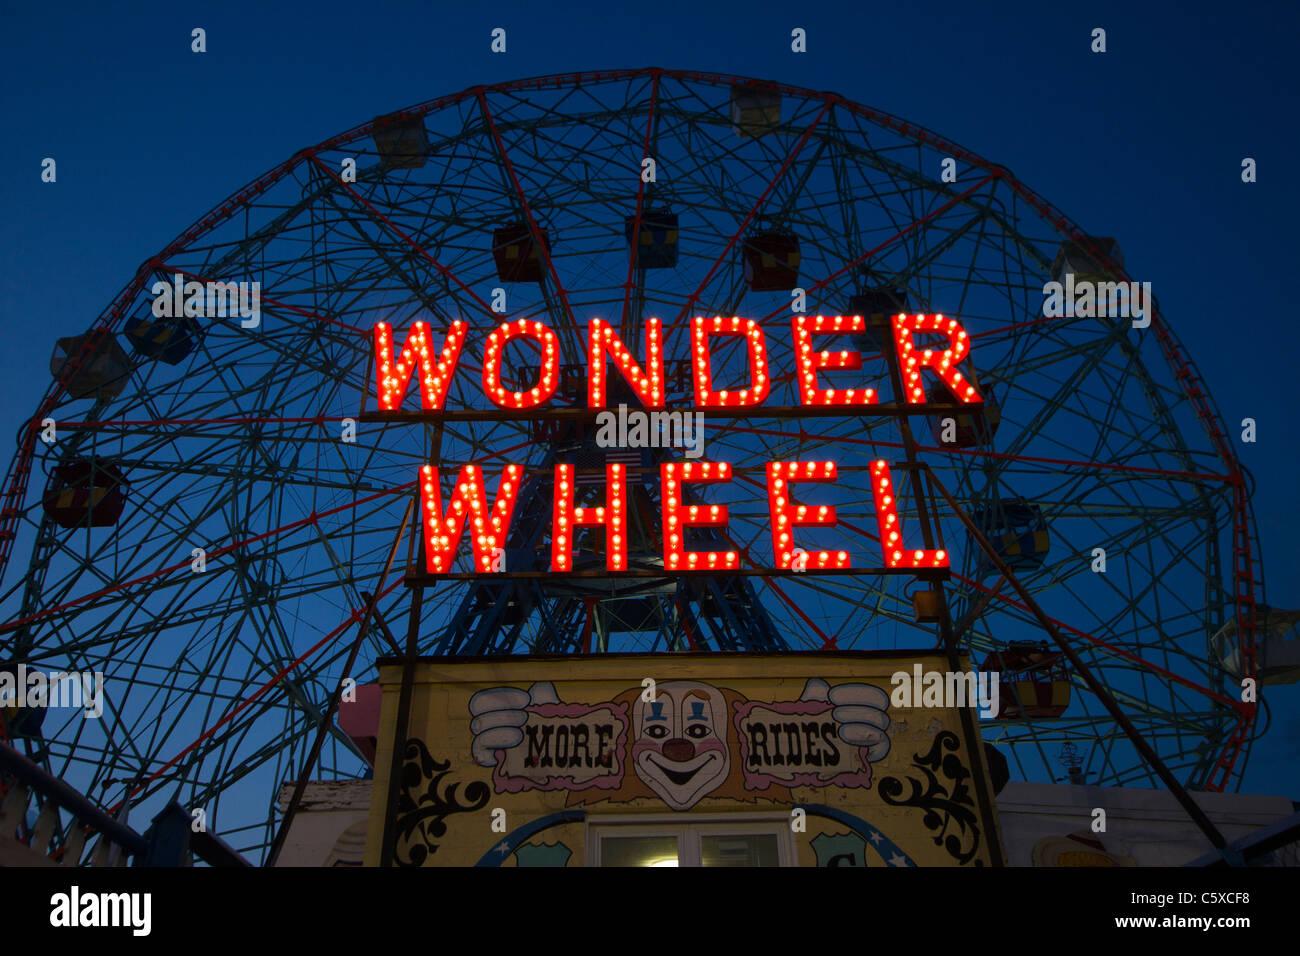 The Wonder Wheel in Coney Island at night - Stock Image